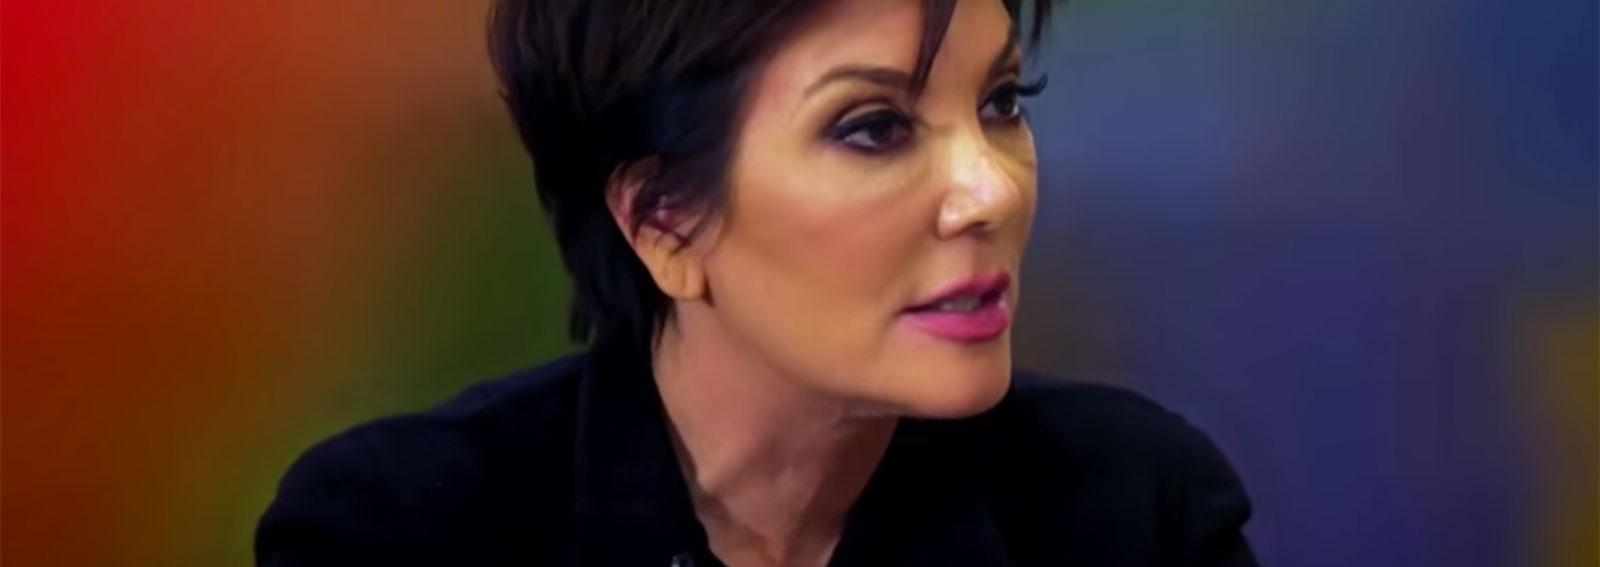 Kris Jenner shuts down Kim Kardashian with ultimate diss